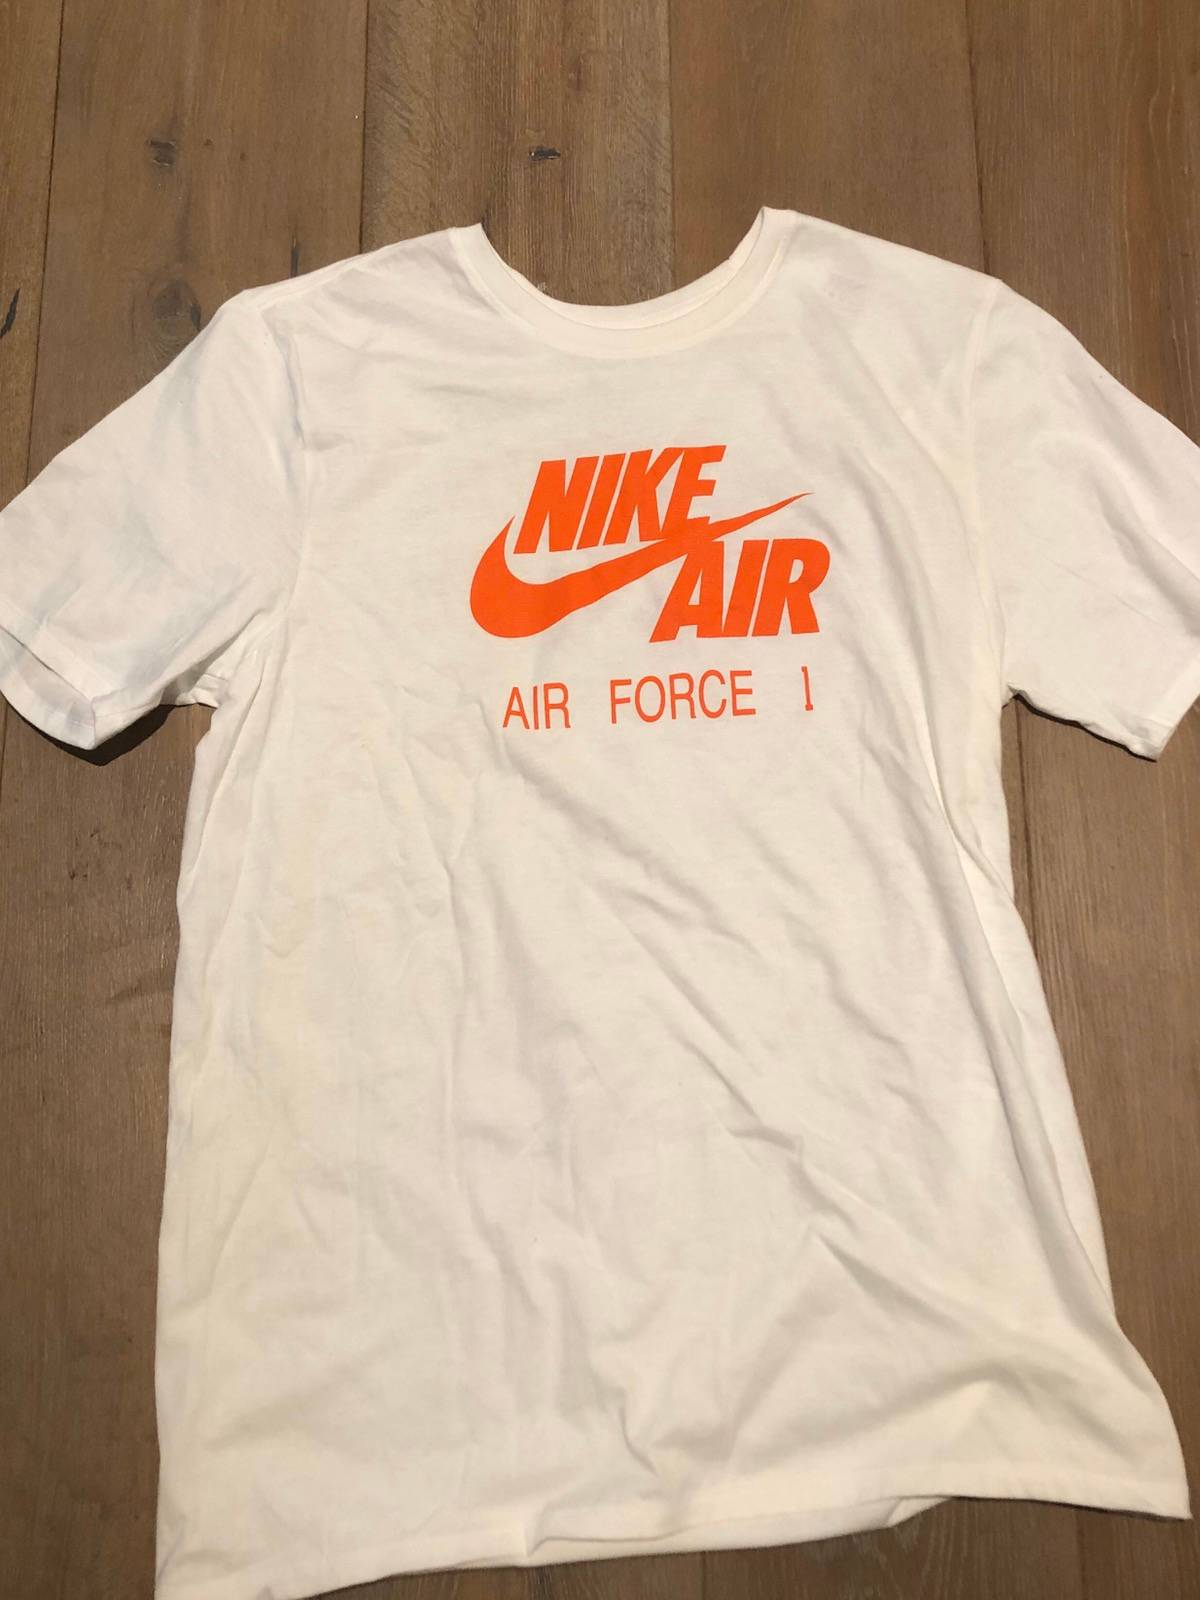 mirada detallada Moda super barato se compara con Nike Nike Air Force 1 X Travis Scott T-shirt   Grailed